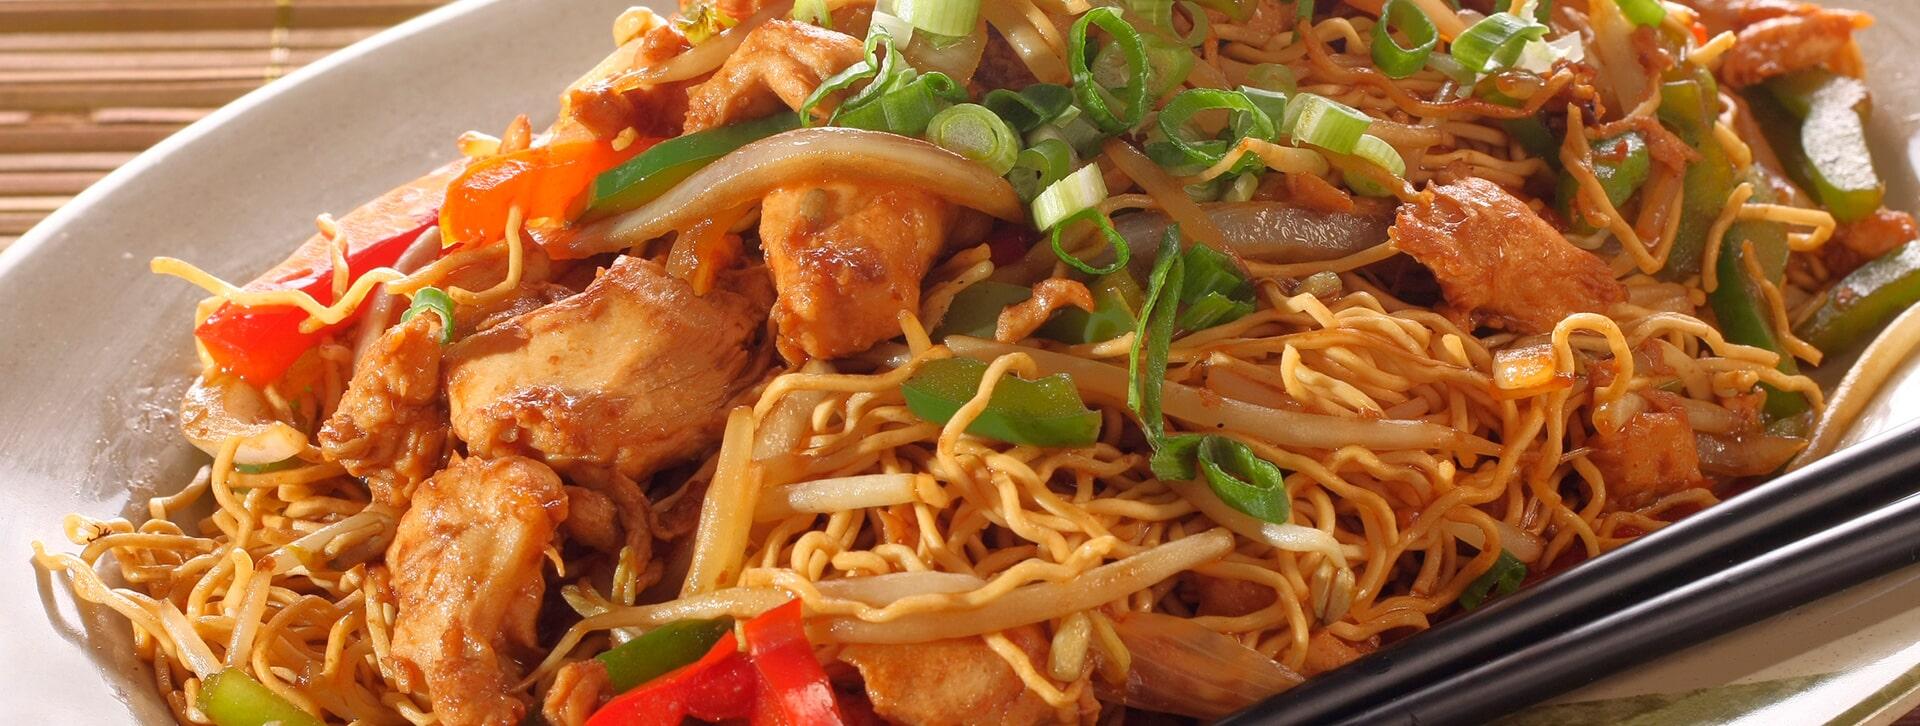 Comida china a domicilio 24 horas madrid